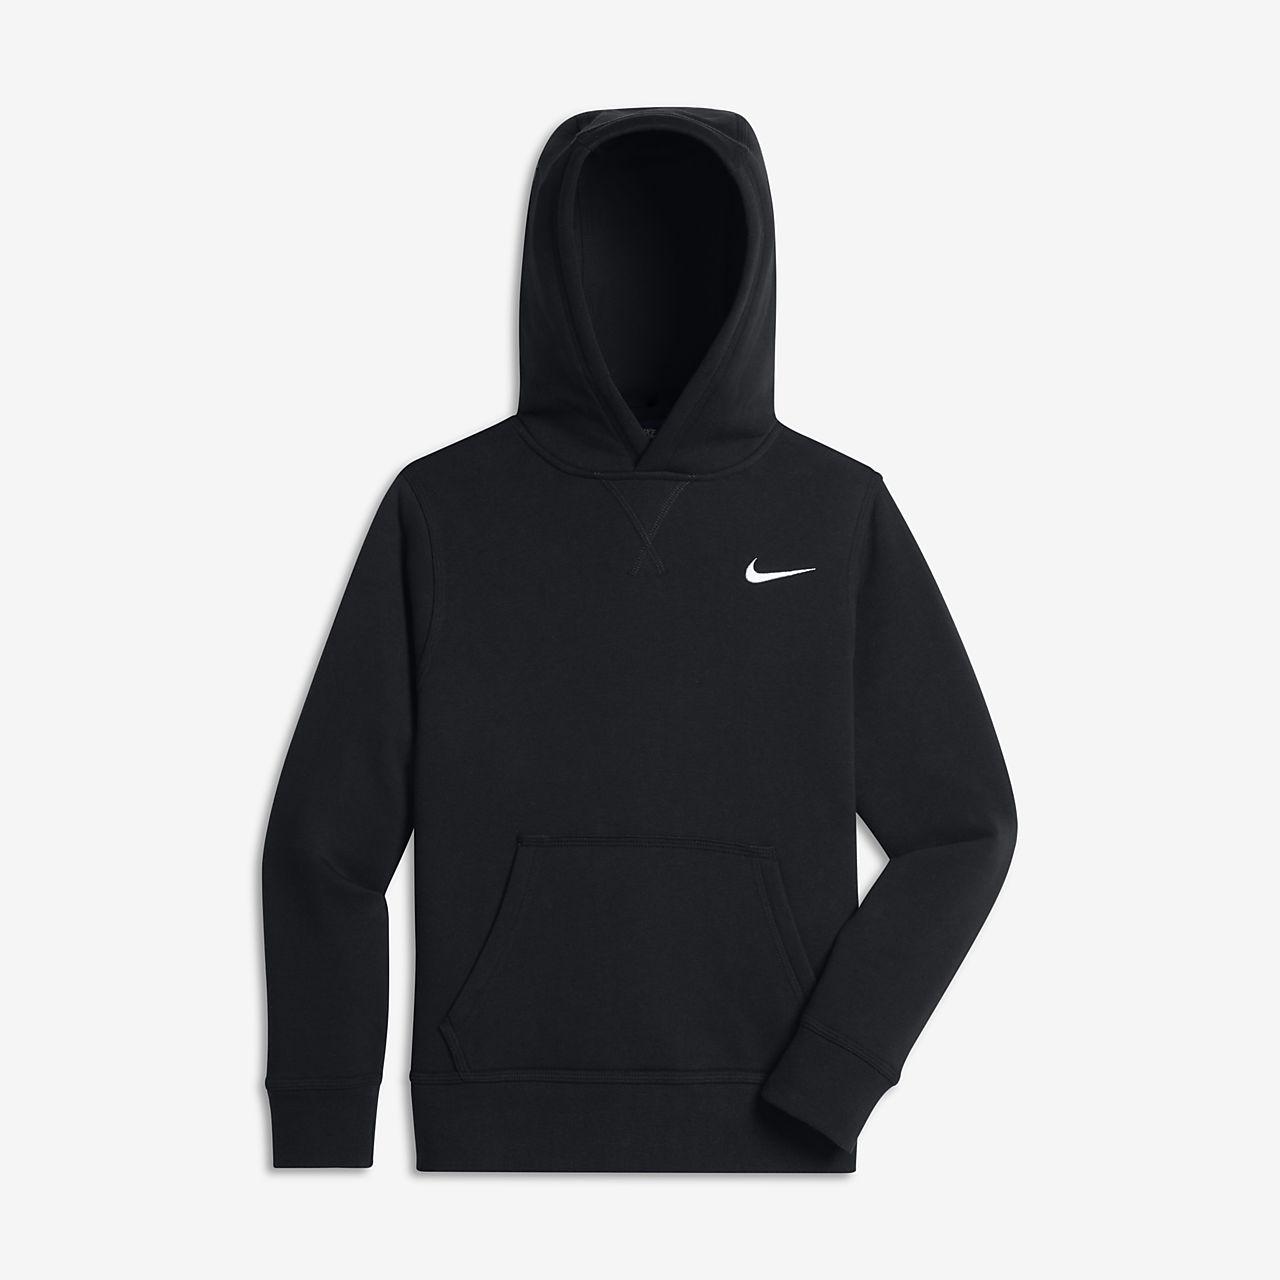 Nike Kinder-Trainingshoodie